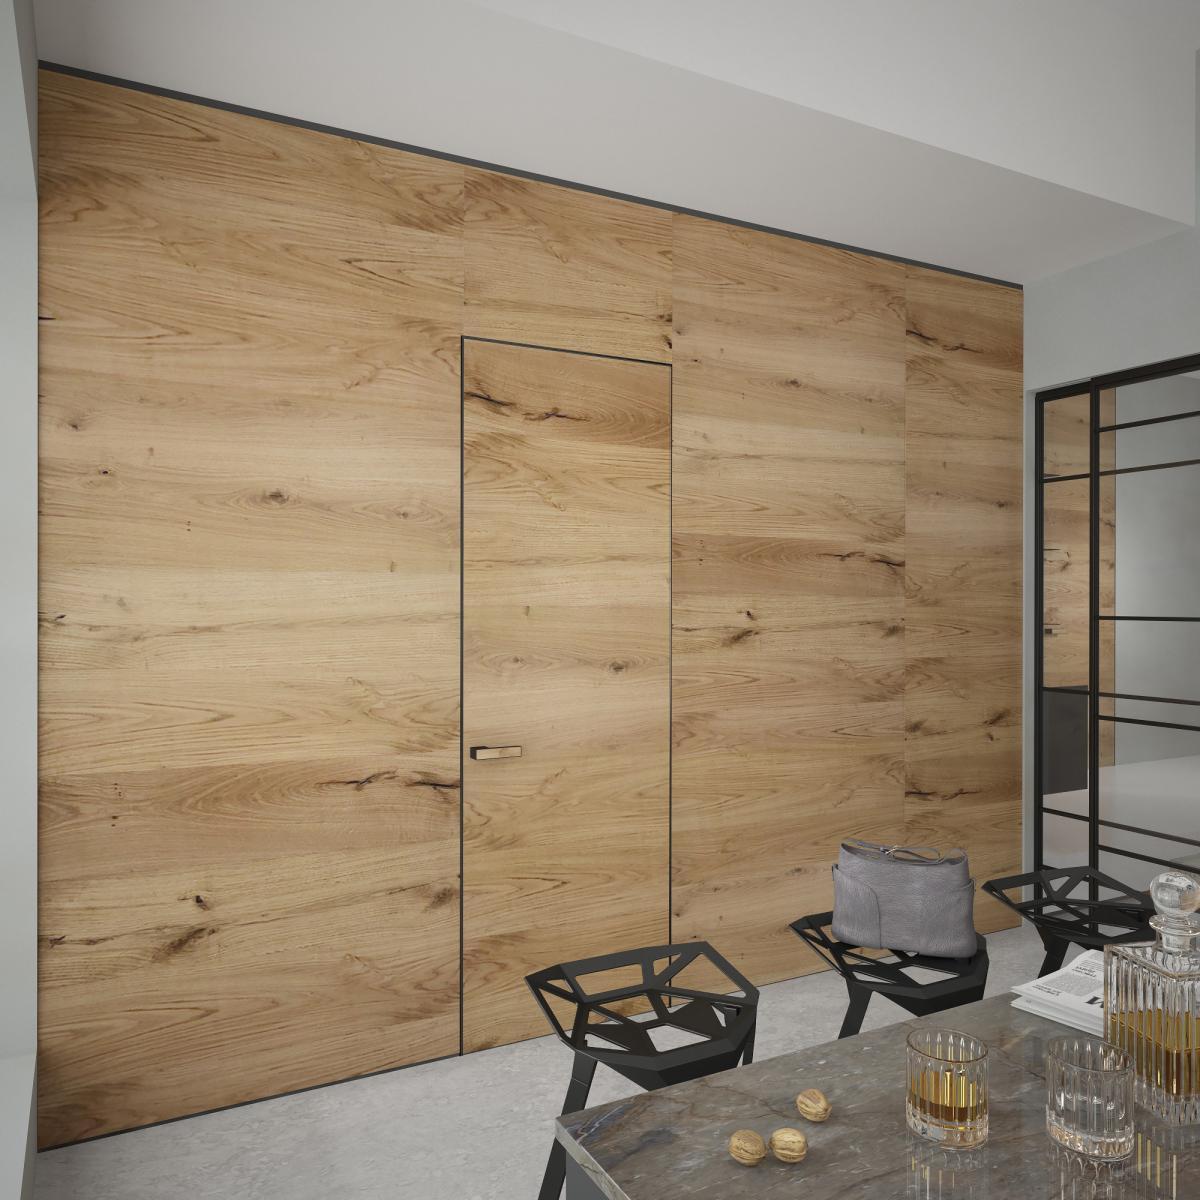 Стеновые декоративные панели. МДФ, HPL, шпон, покраска или зеркало